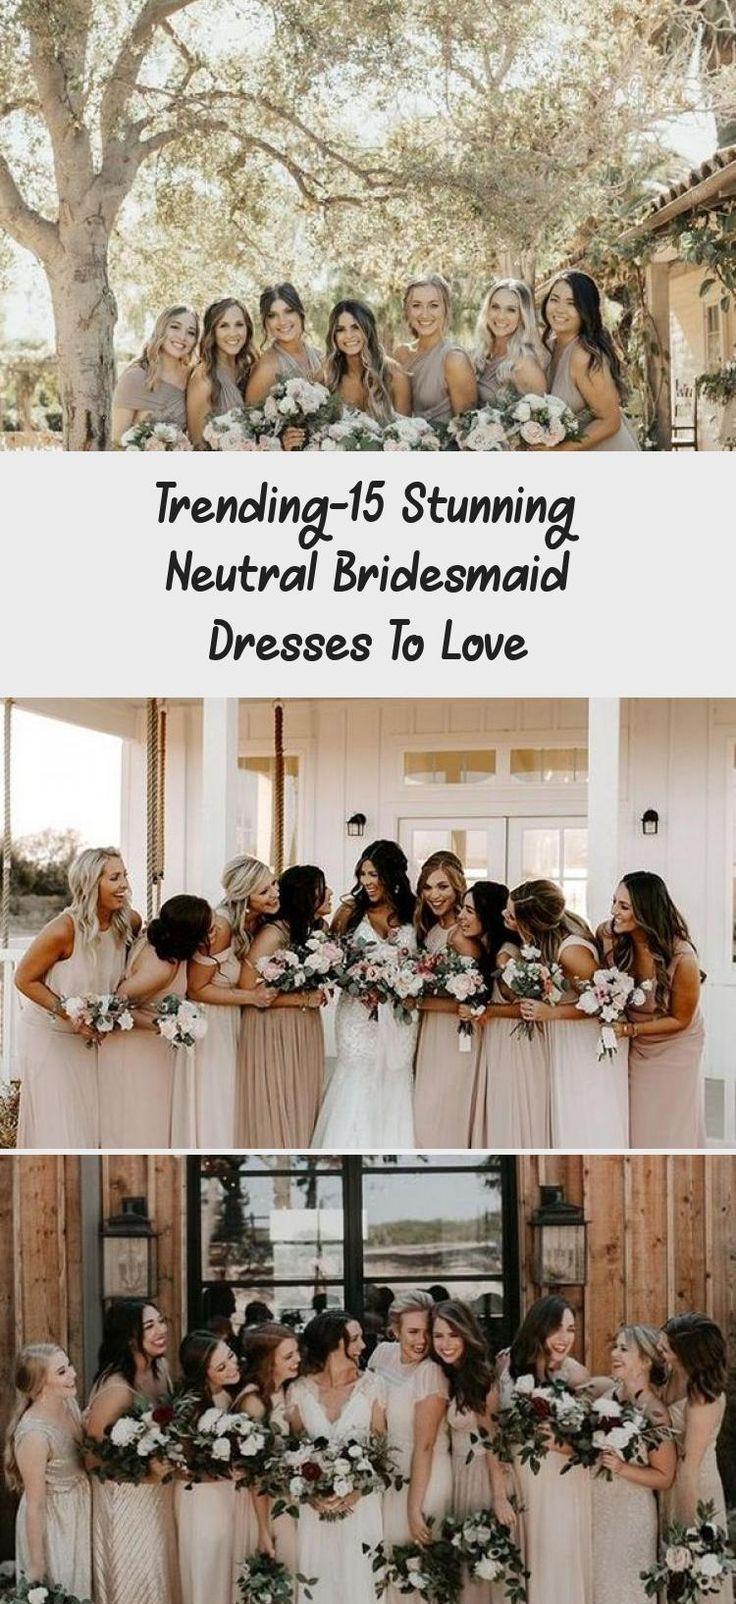 neutral champagne bridesmaid dresses #obde #weddingideas2019 #BridesmaidDresses2018 #TealBridesmaidDresses #PeachBridesmaidDresses #WhiteBridesmaidDresses #VelvetBridesmaidDresses